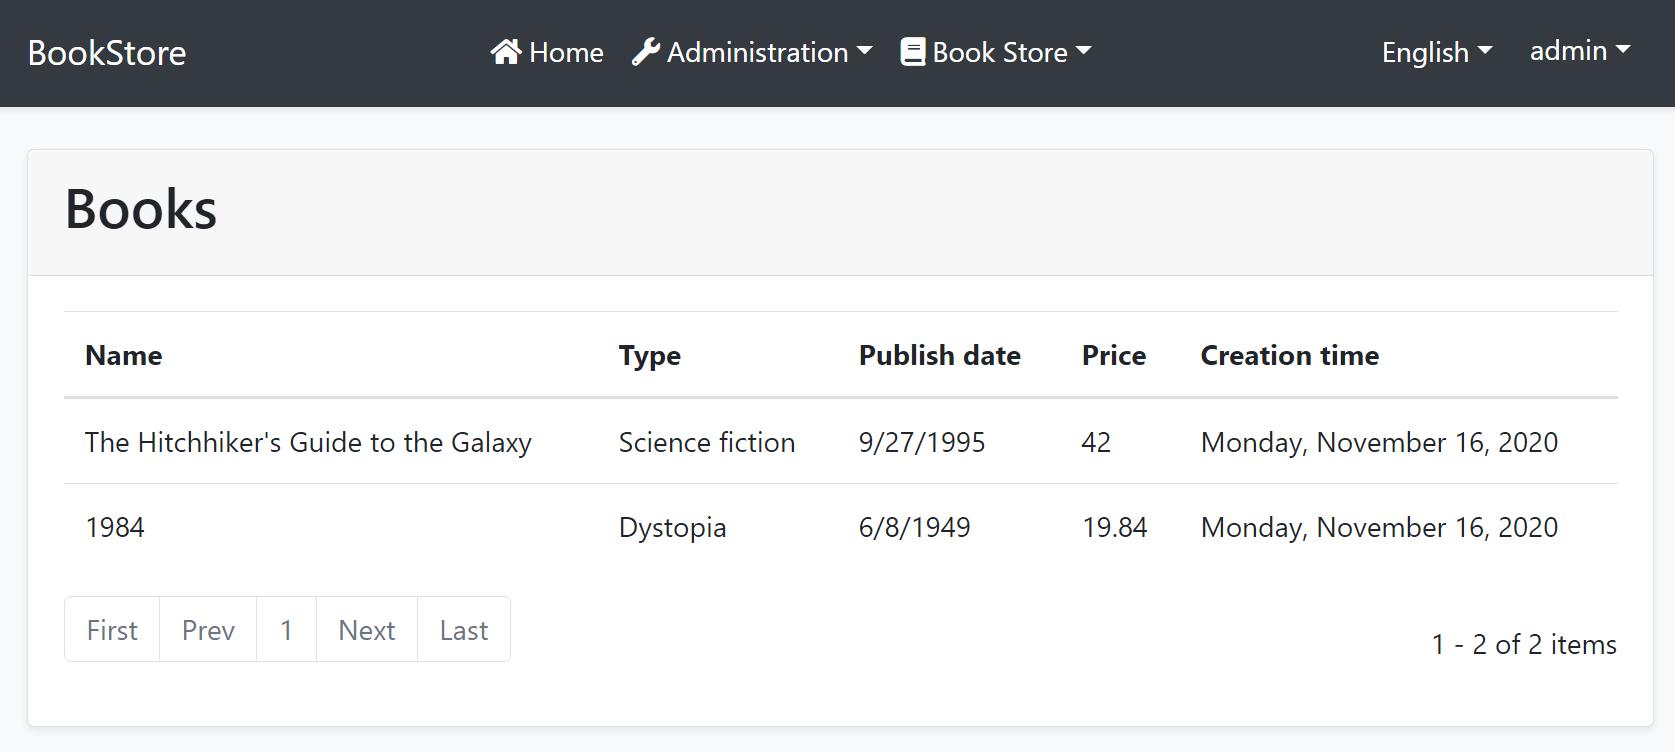 blazor-bookstore-book-list